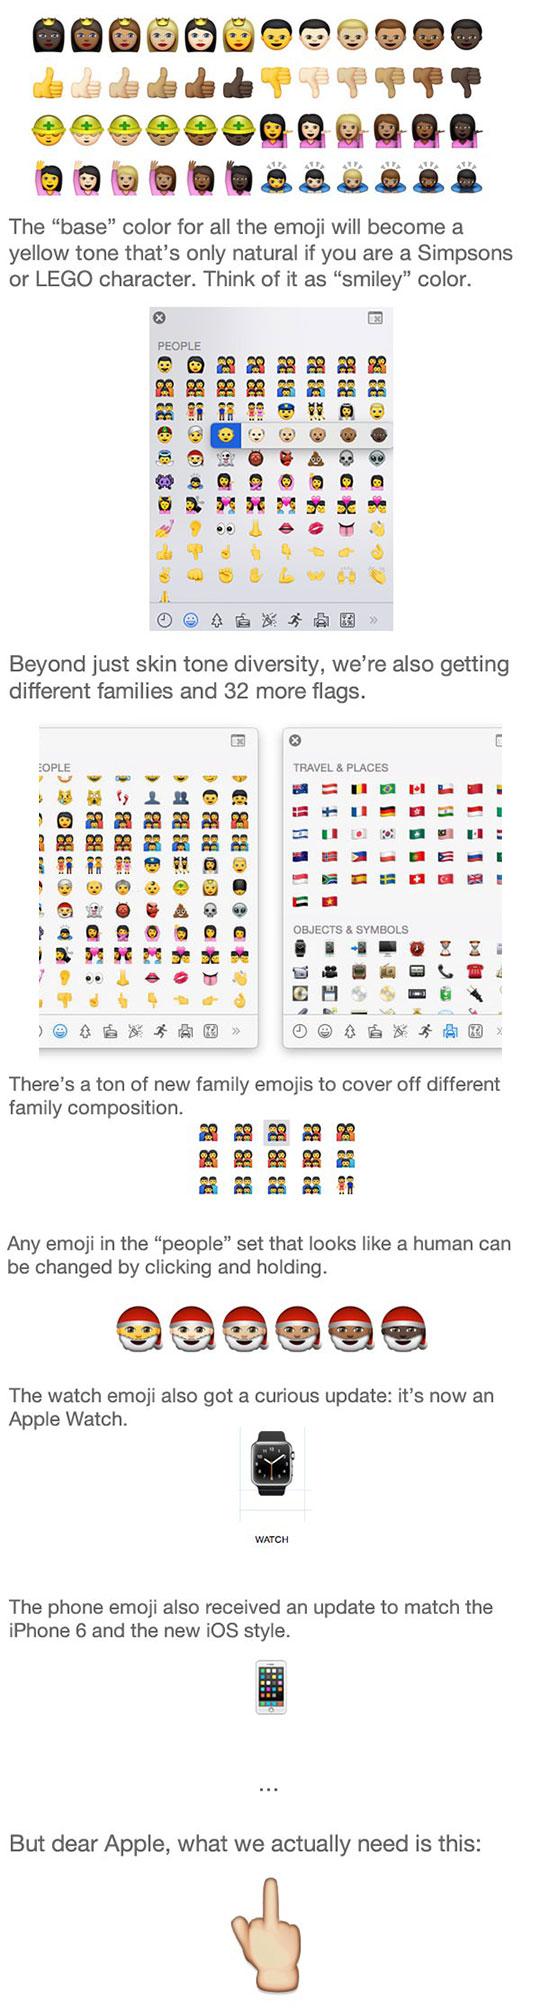 cool-Apple-emoji-diversity-colors